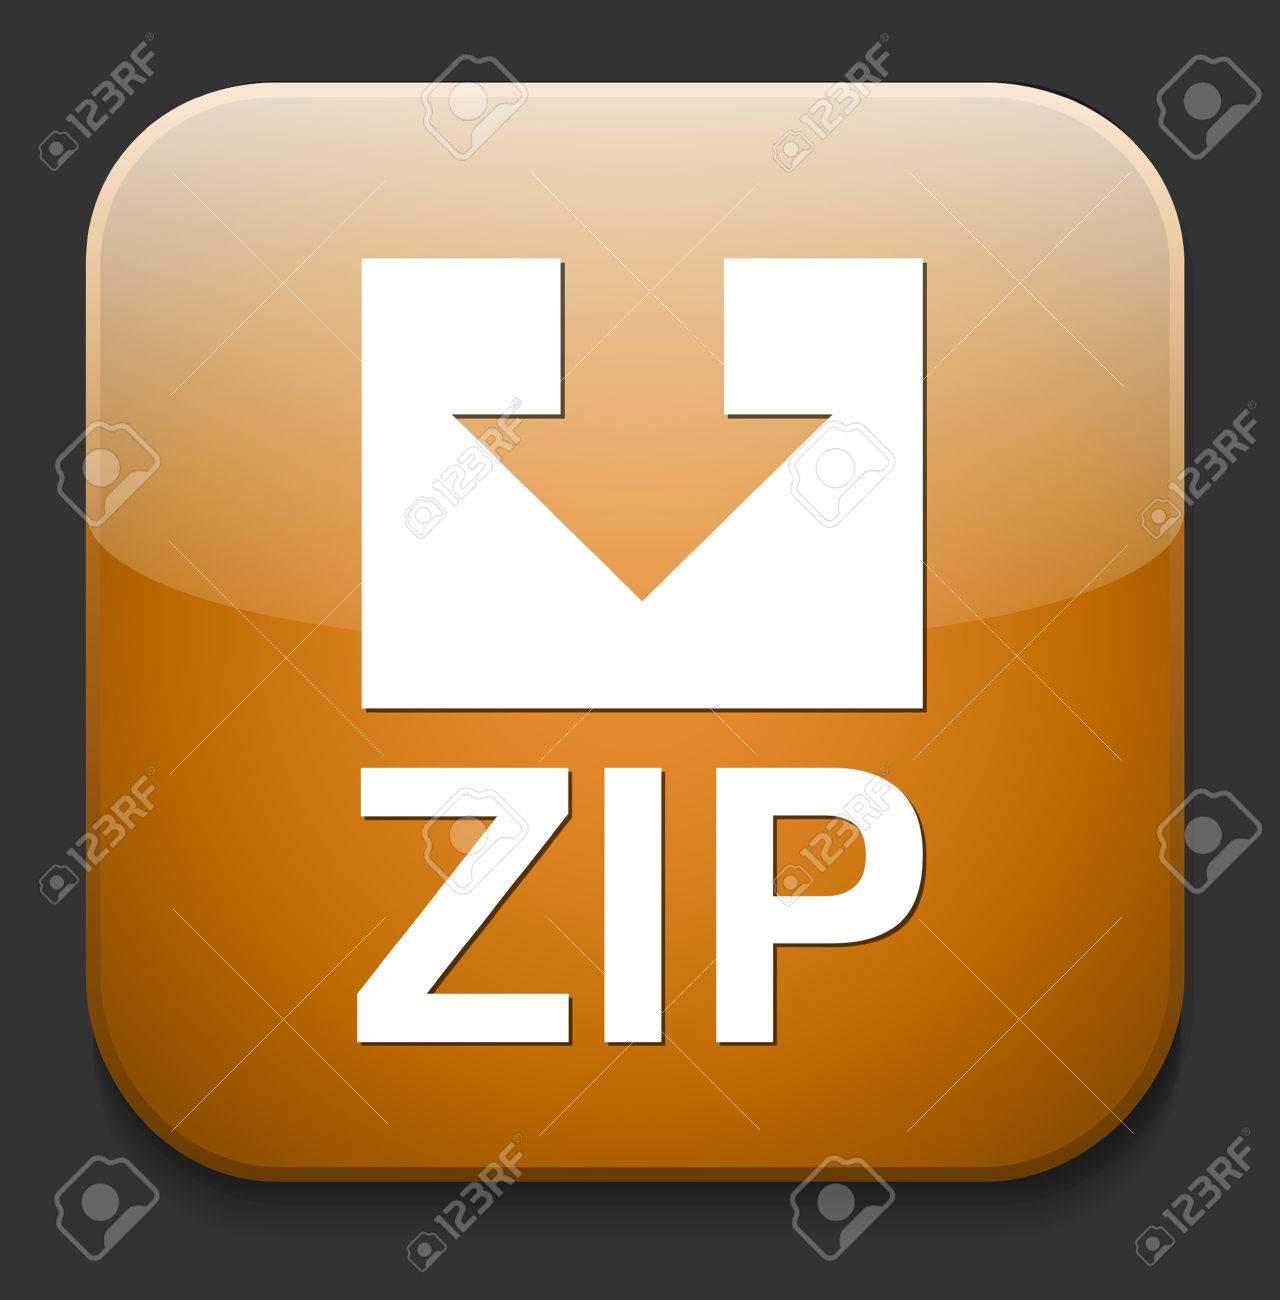 Zip file icon Stock Vector - 28679960